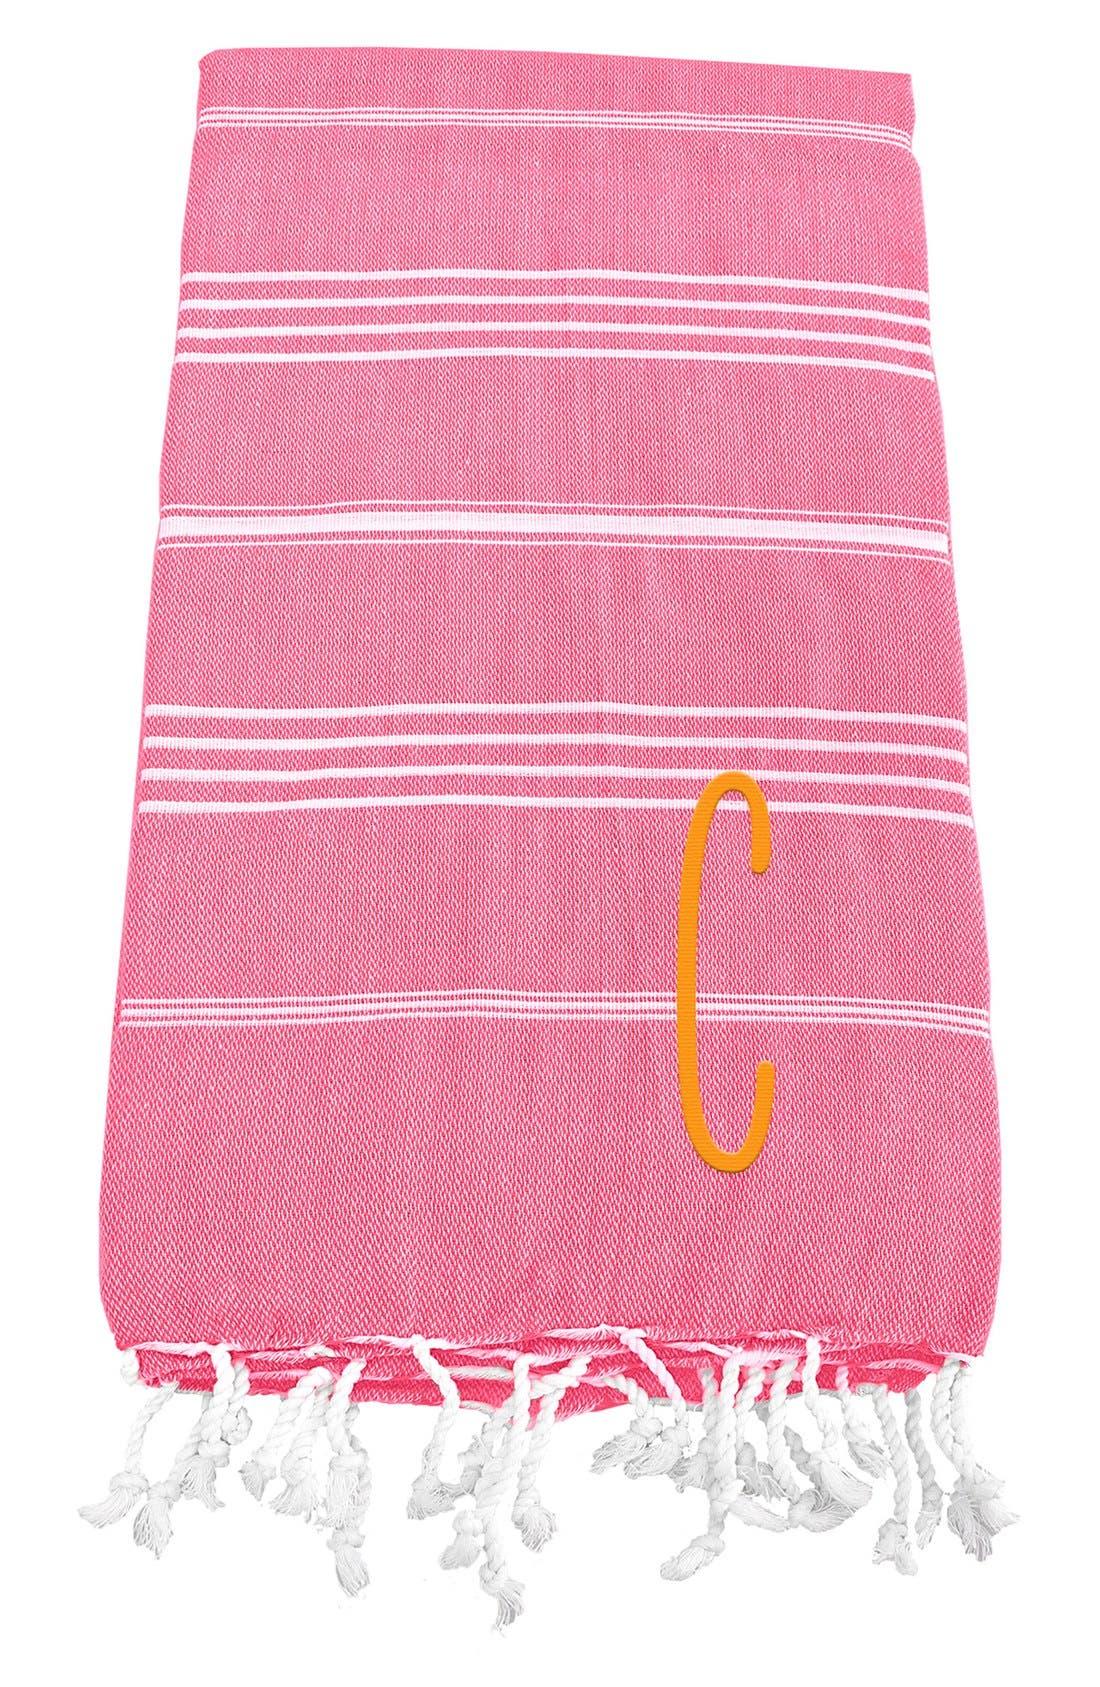 Monogram Turkish Cotton Towel,                             Main thumbnail 139, color,